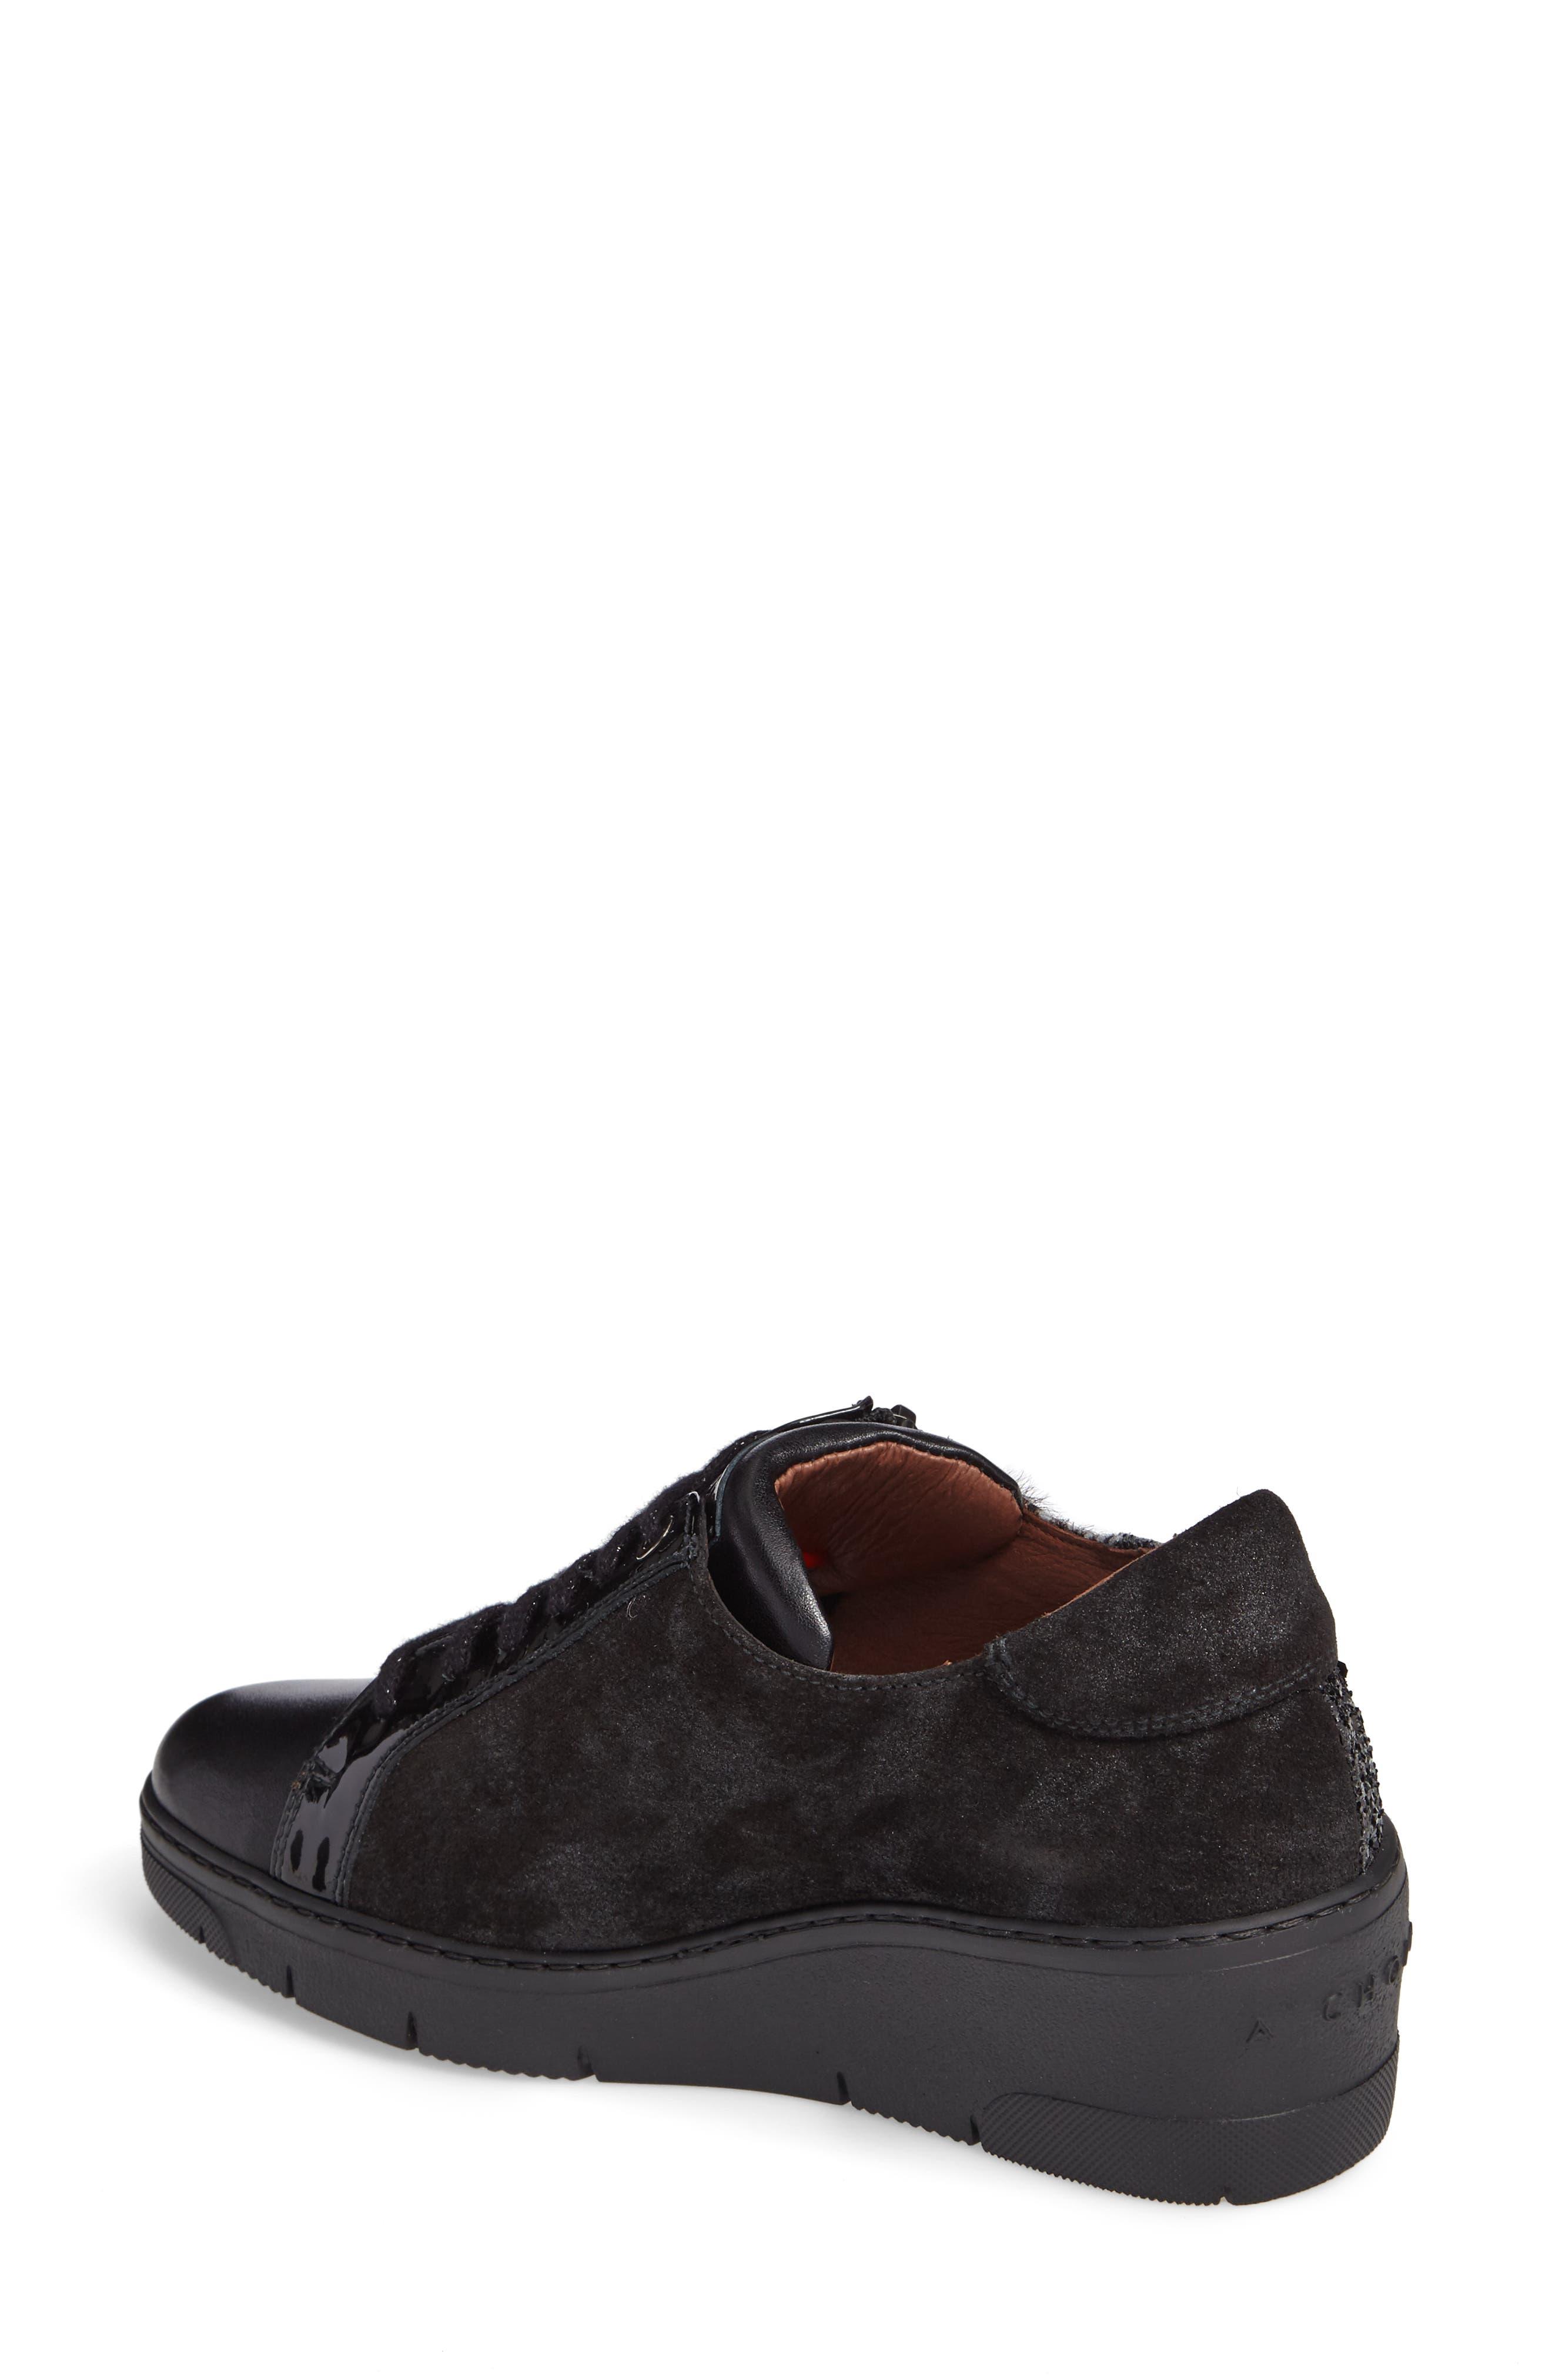 Sammi Sneaker,                             Alternate thumbnail 2, color,                             Black Leather